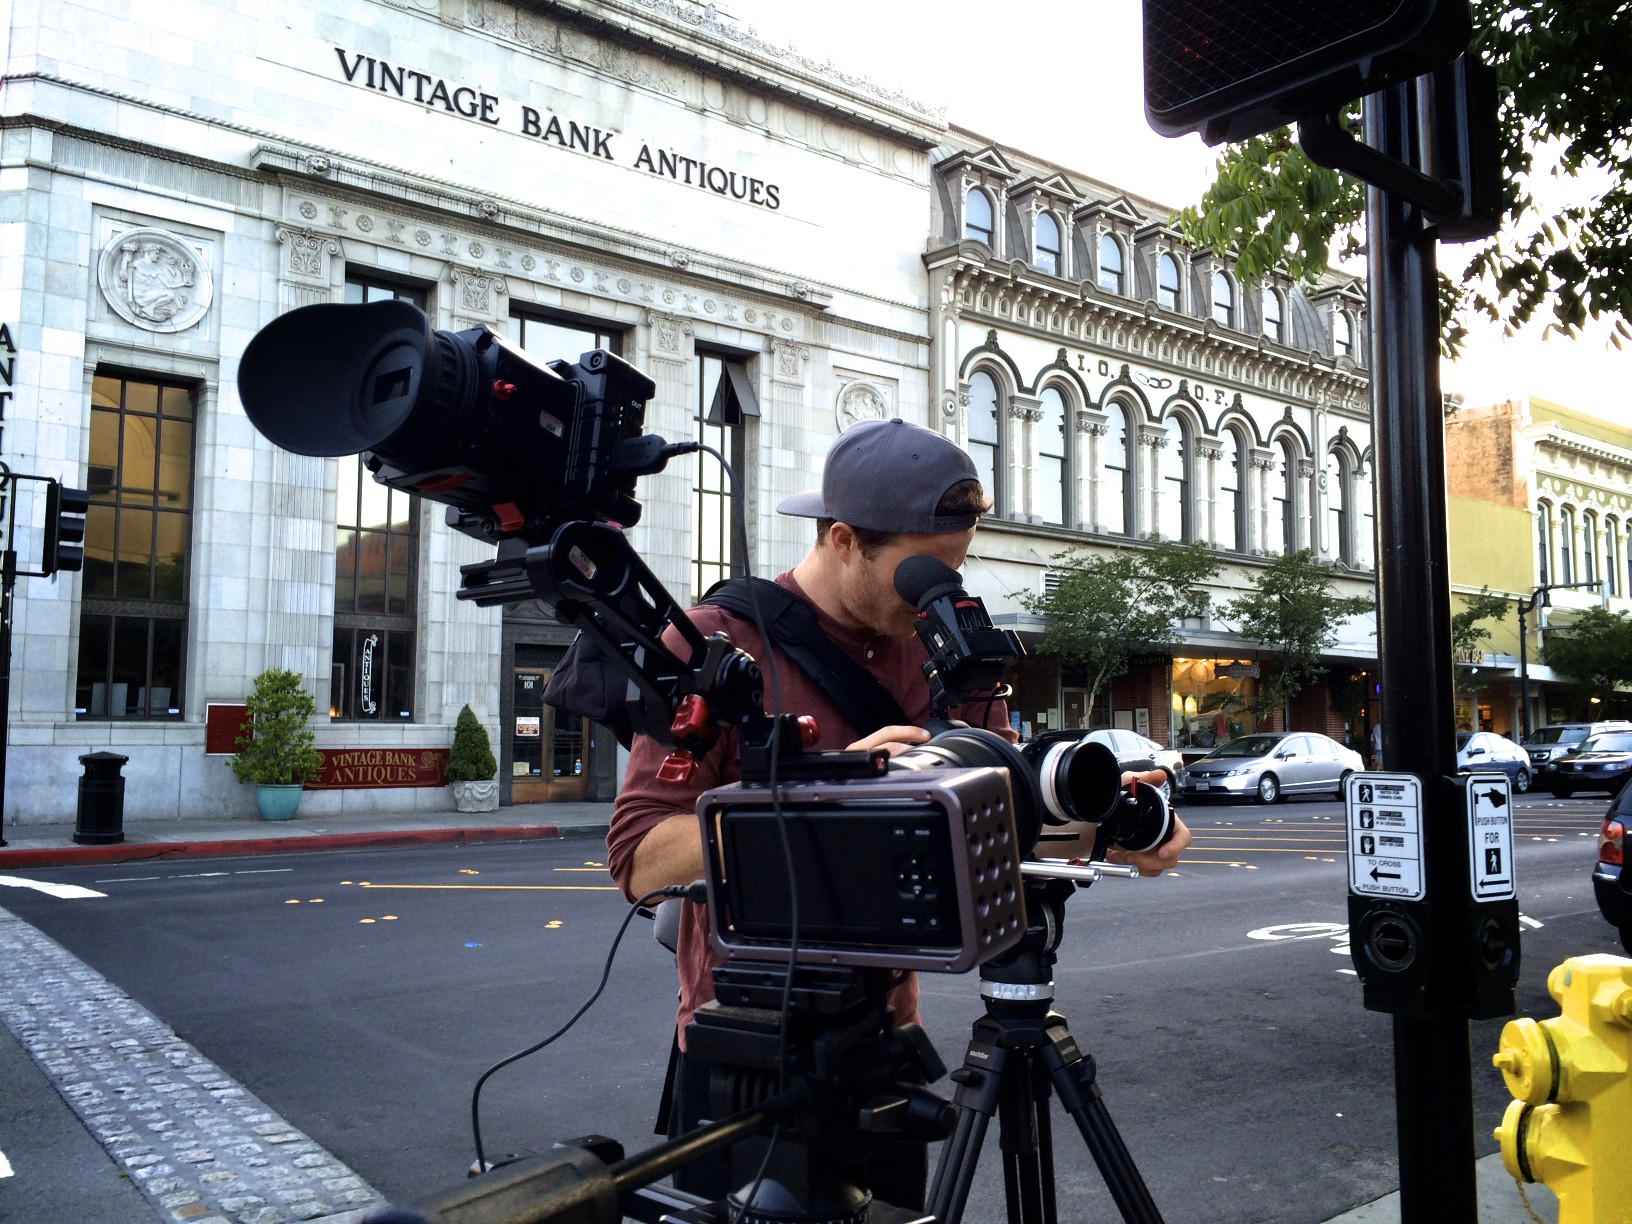 Canon L 70-200mm test in streets of Petaluma, CA.